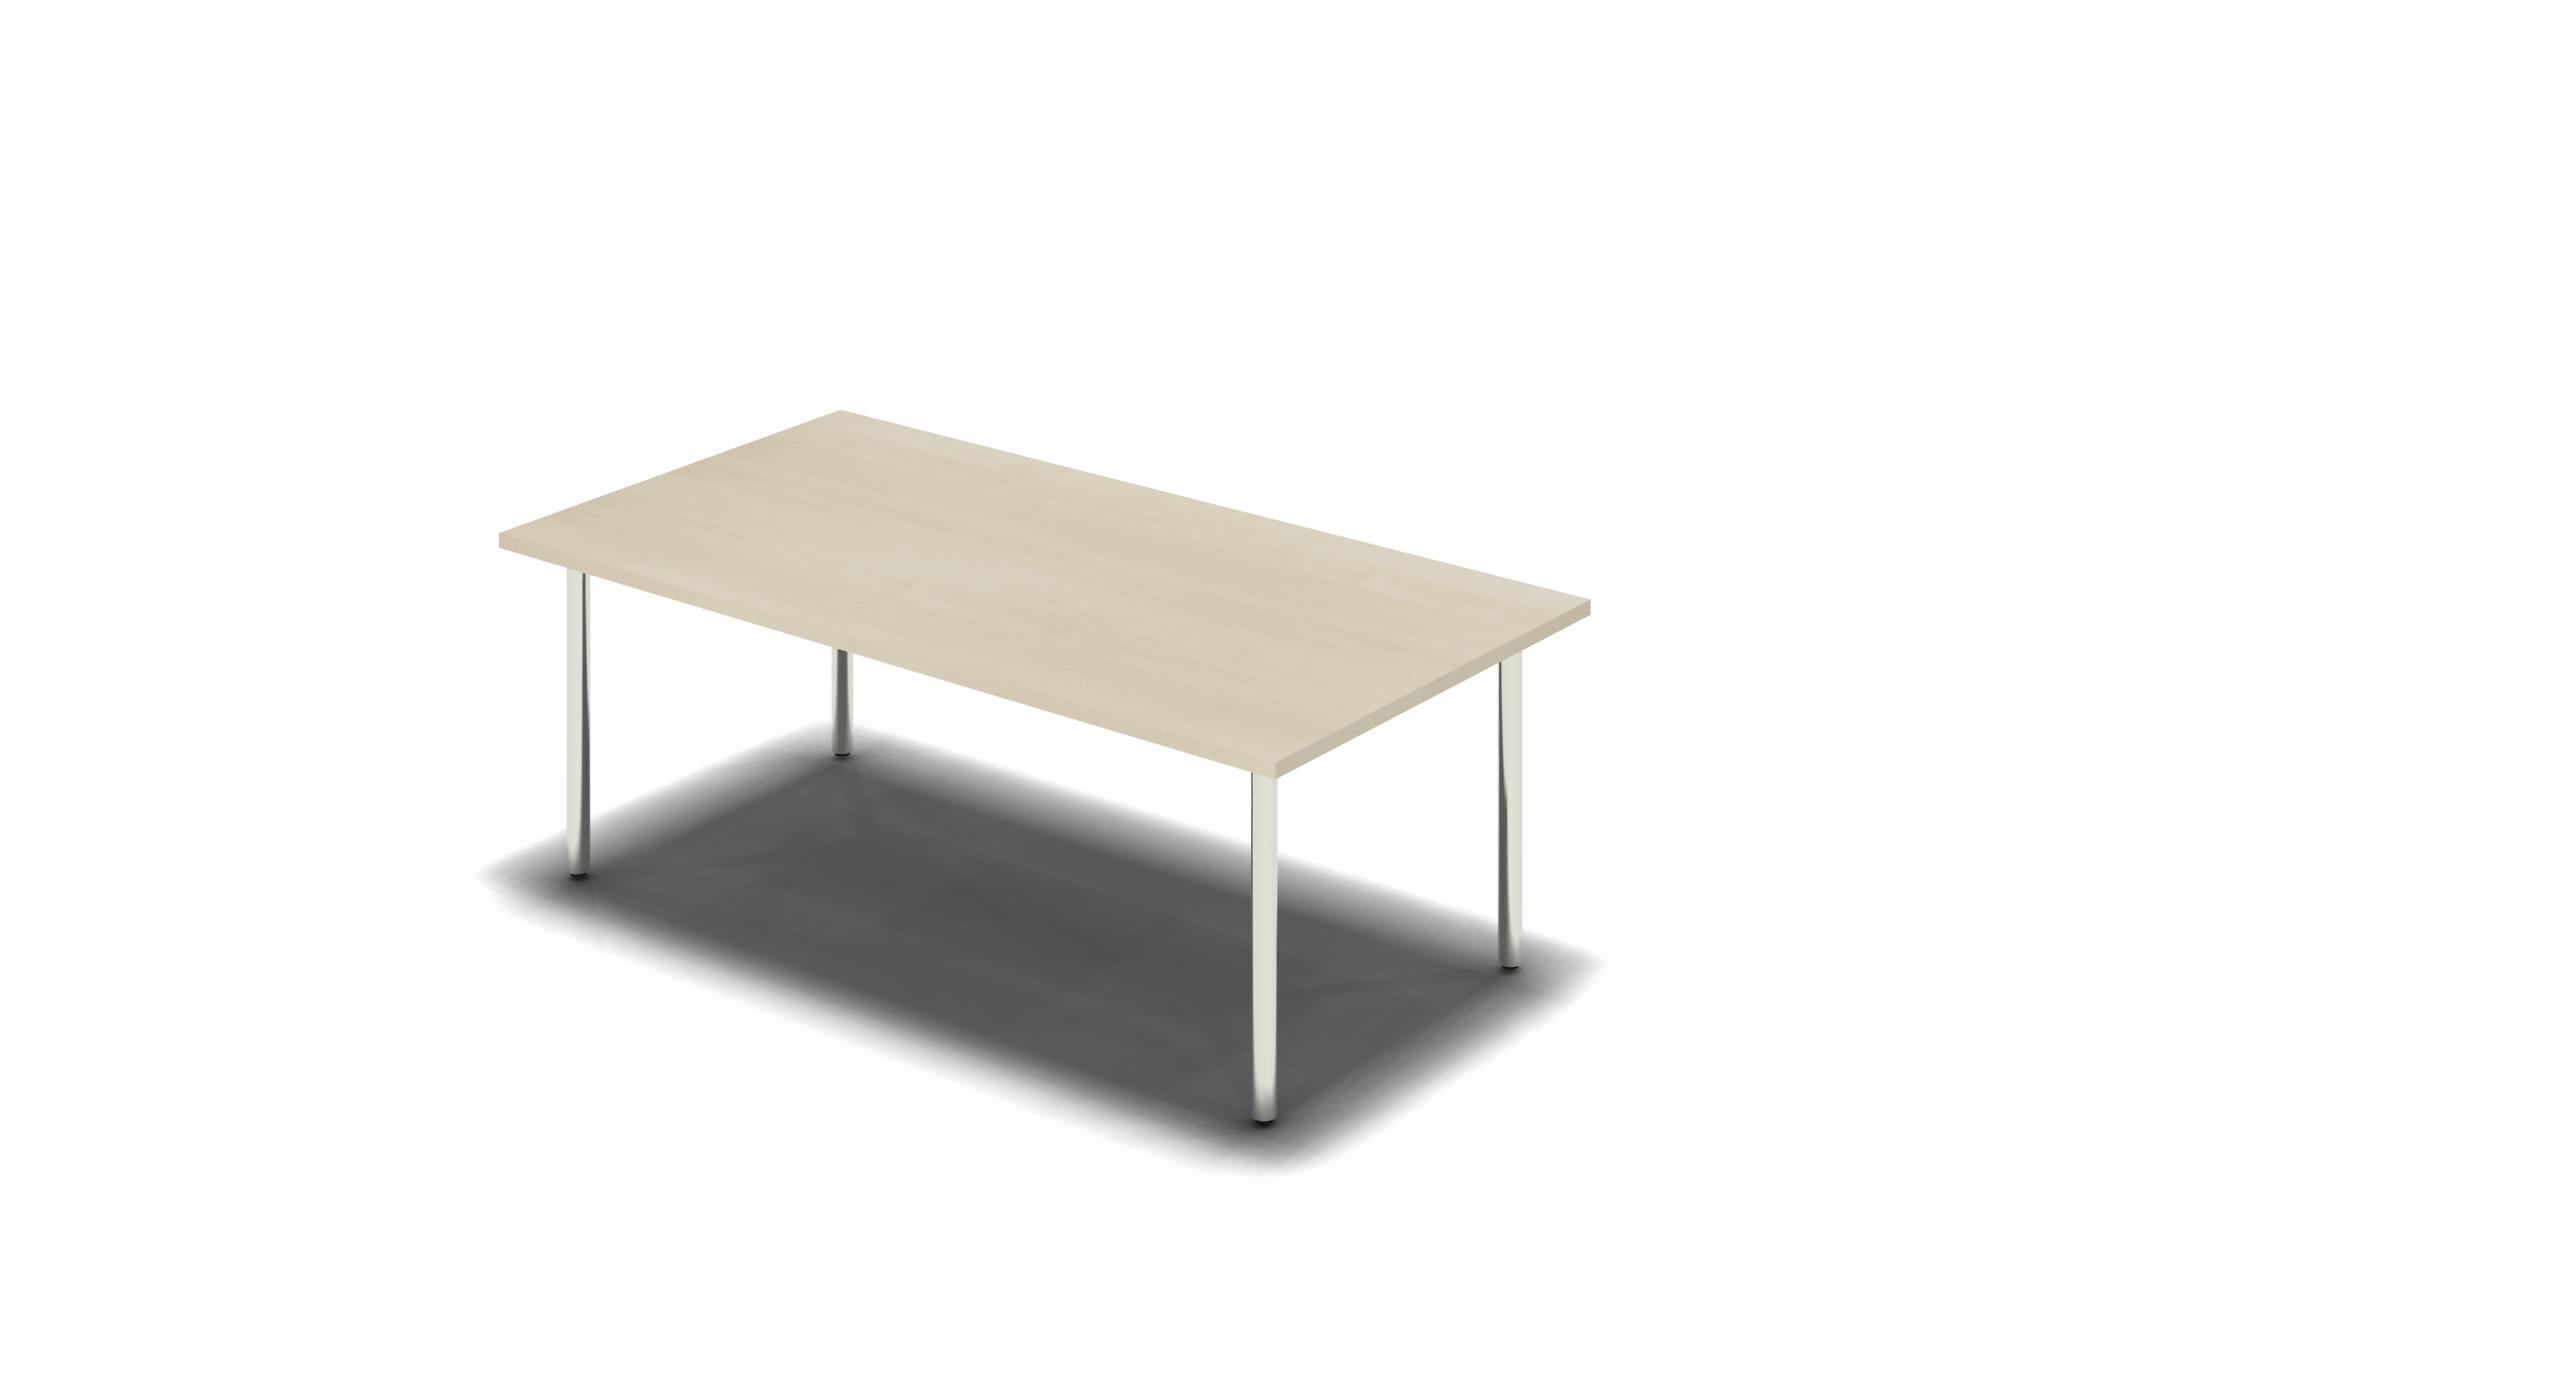 Table_Round_1800x900_Chrome_Maple_noOption